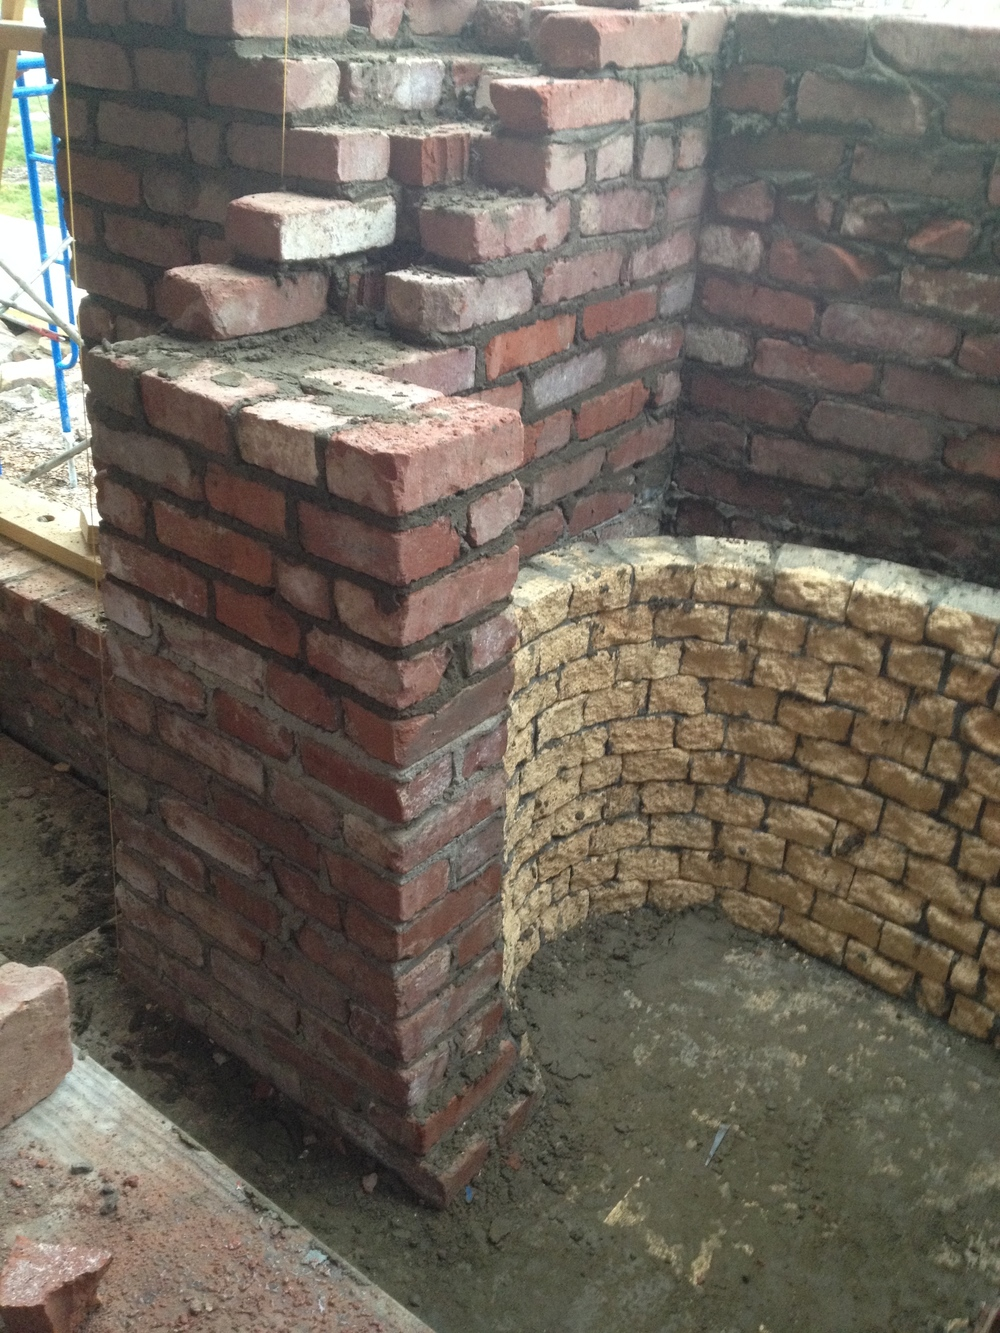 structural masonry, massing out a fireplace's firebox